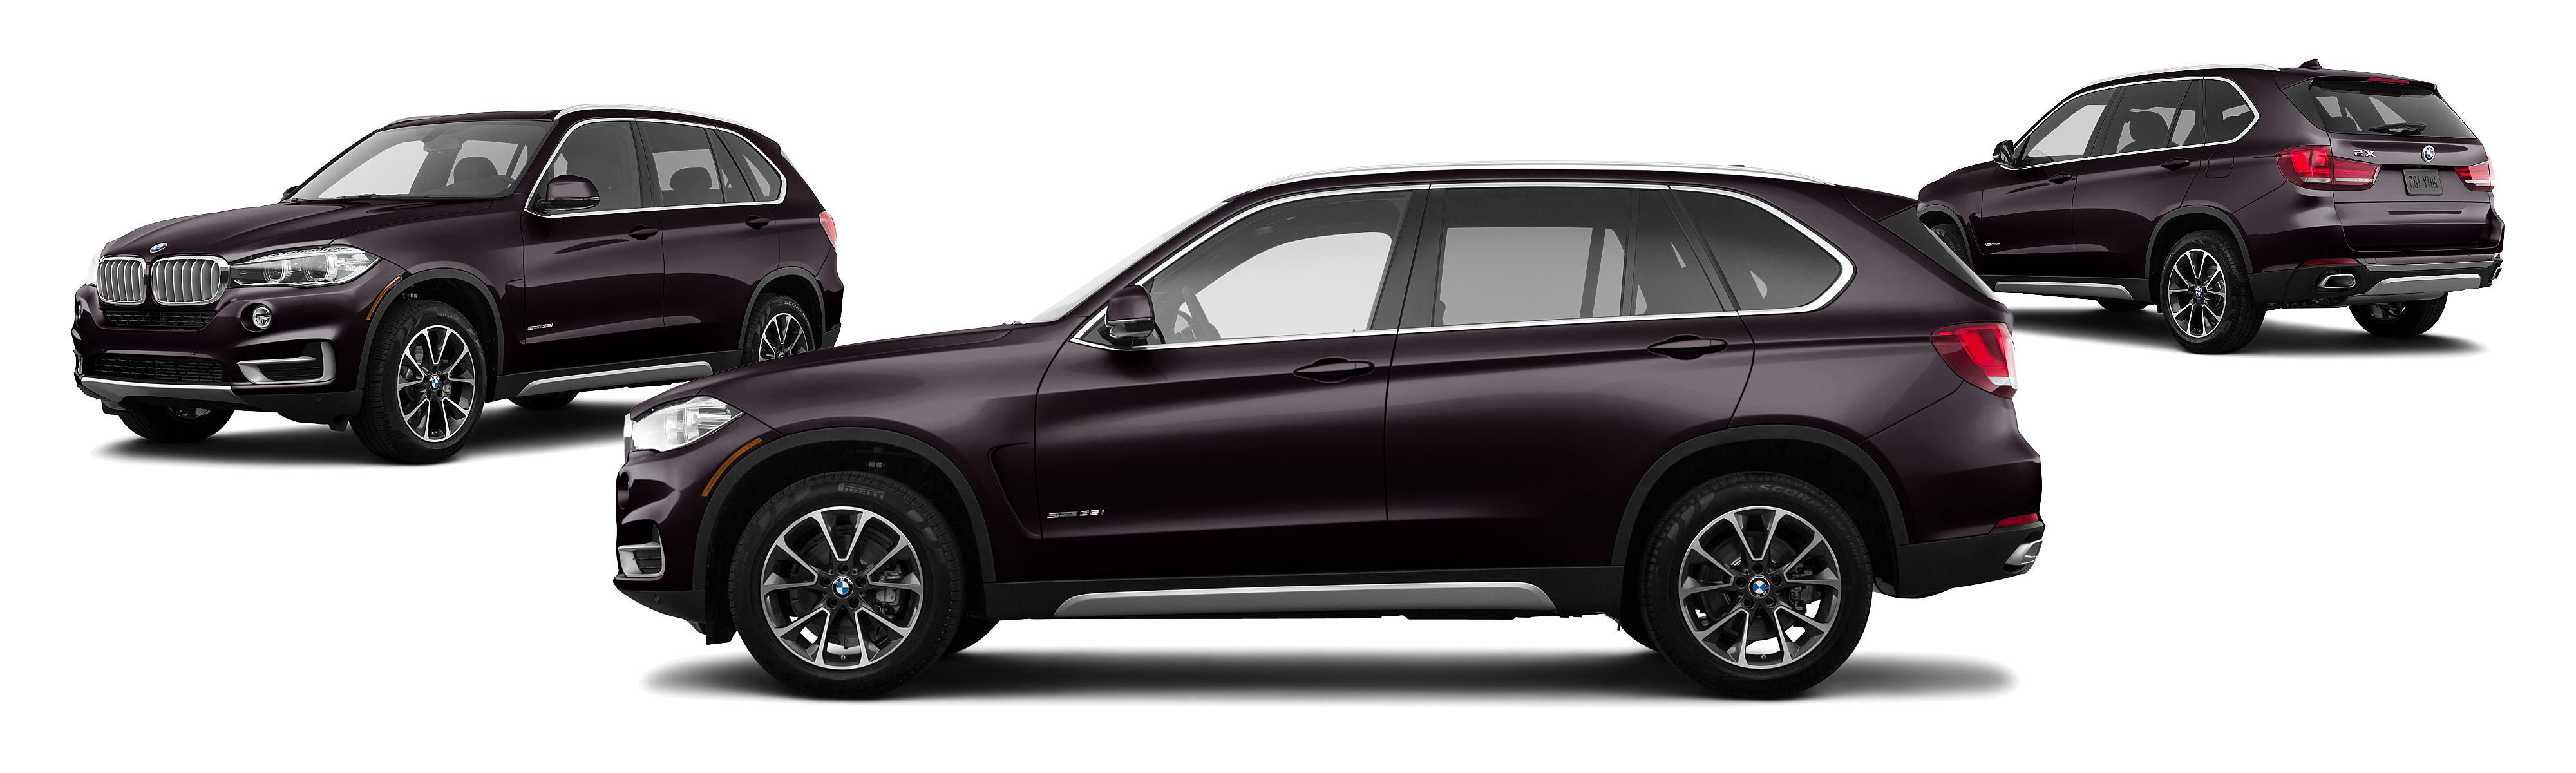 2018 BMW X5 AWD XDrive35d 4dr SUV